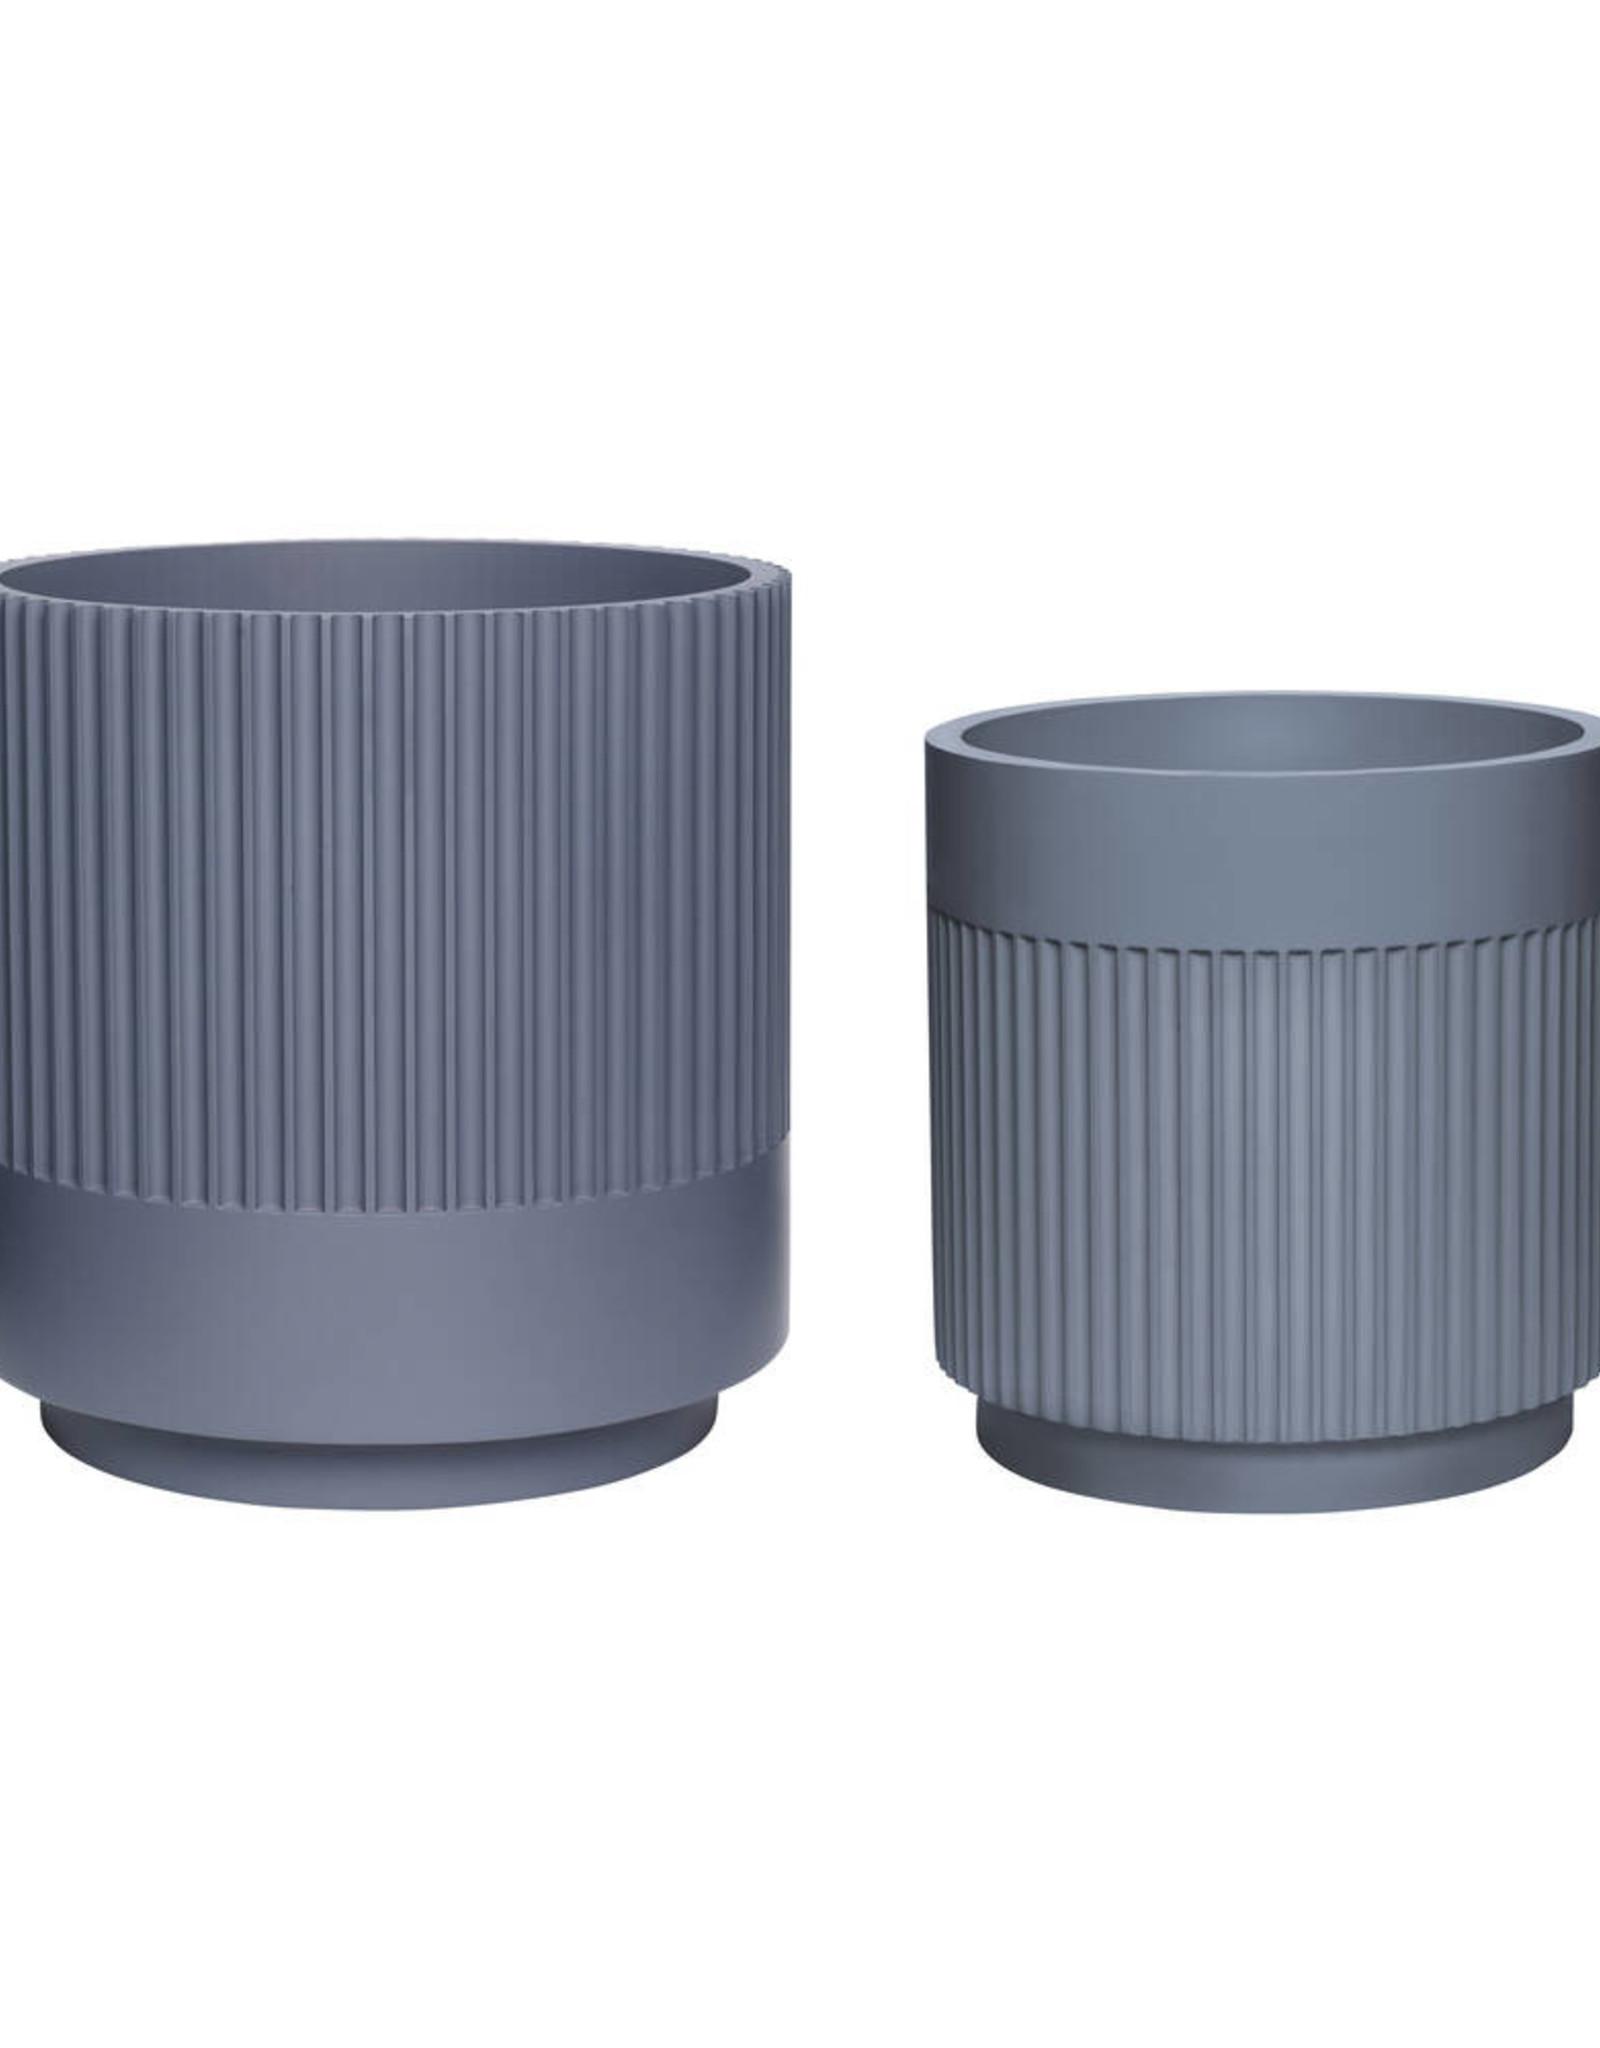 Hübsch Plaster Pot - Dark Grey ø25xh26